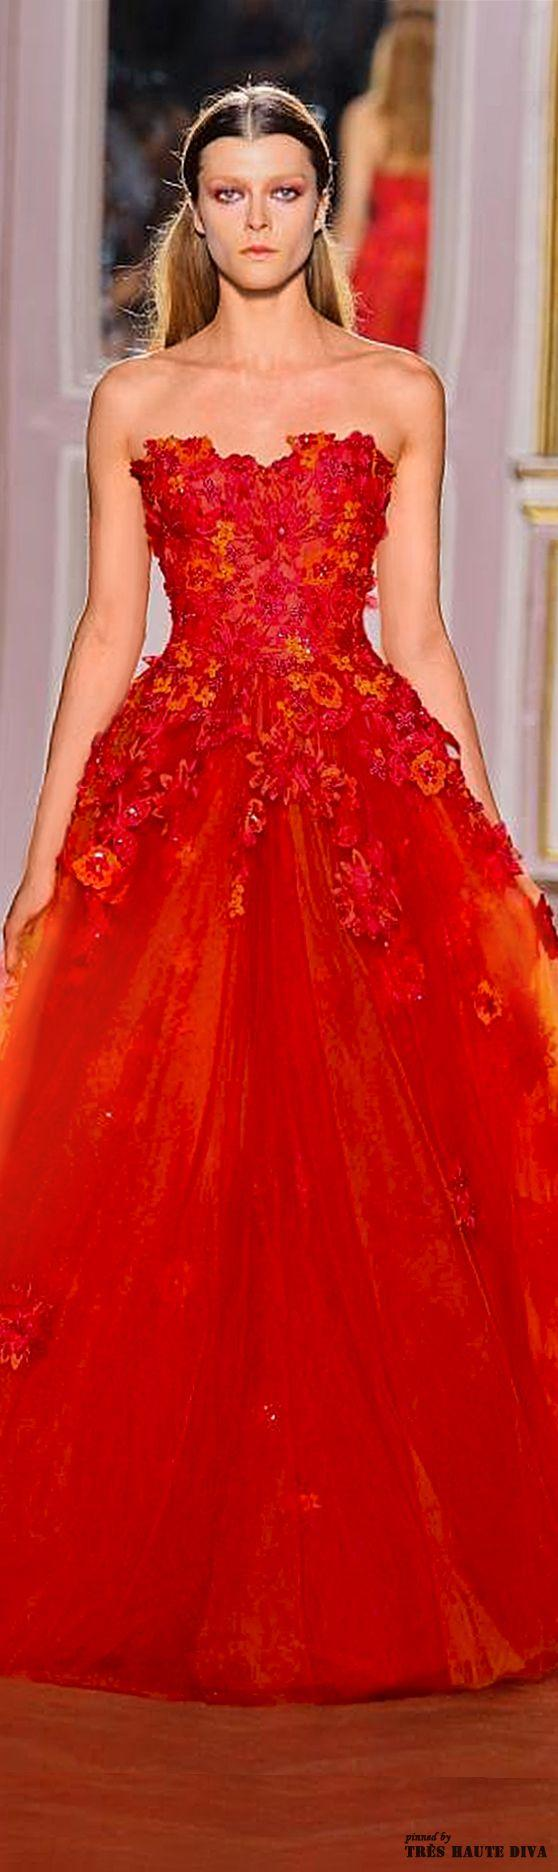 Mariage - Robes ... Ravissante Reds